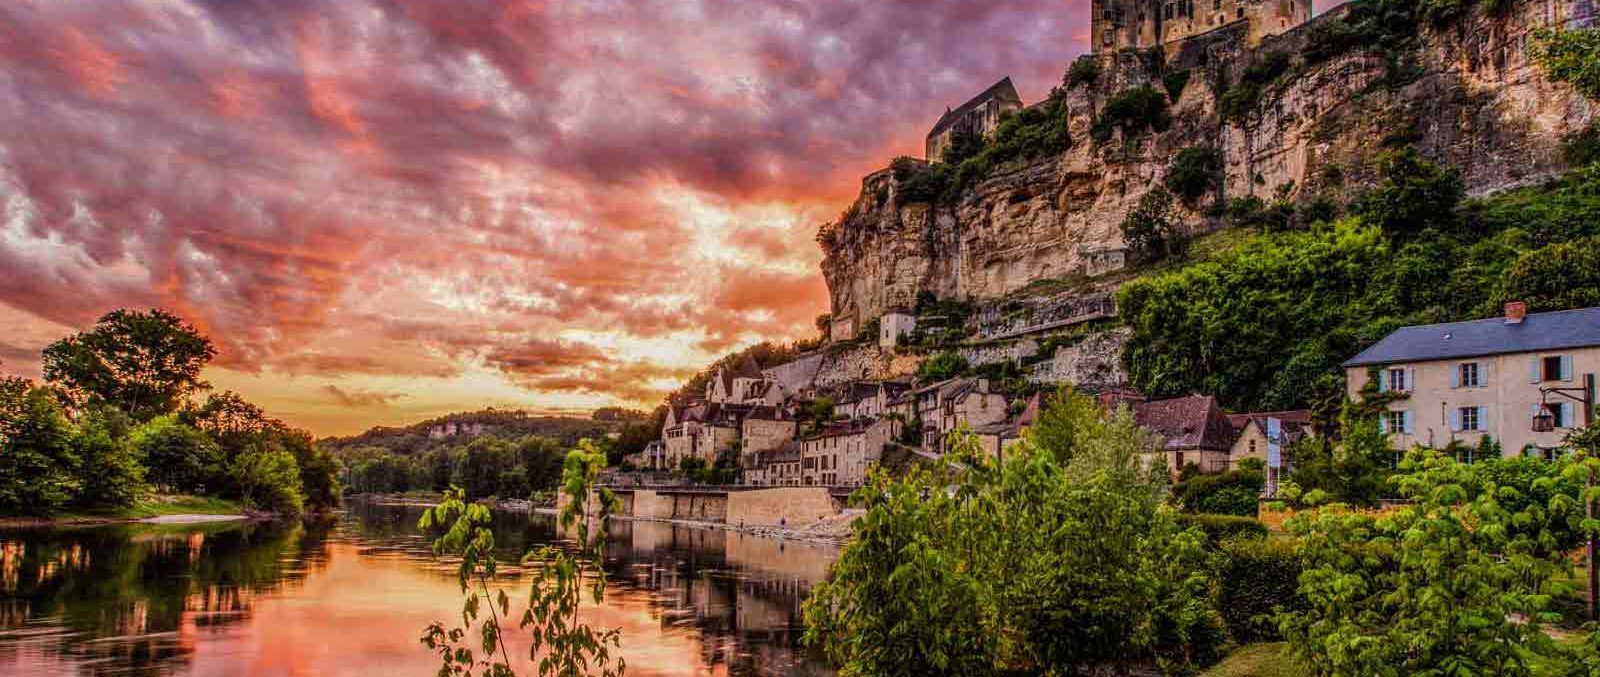 camping Dordogne 4 étoiles